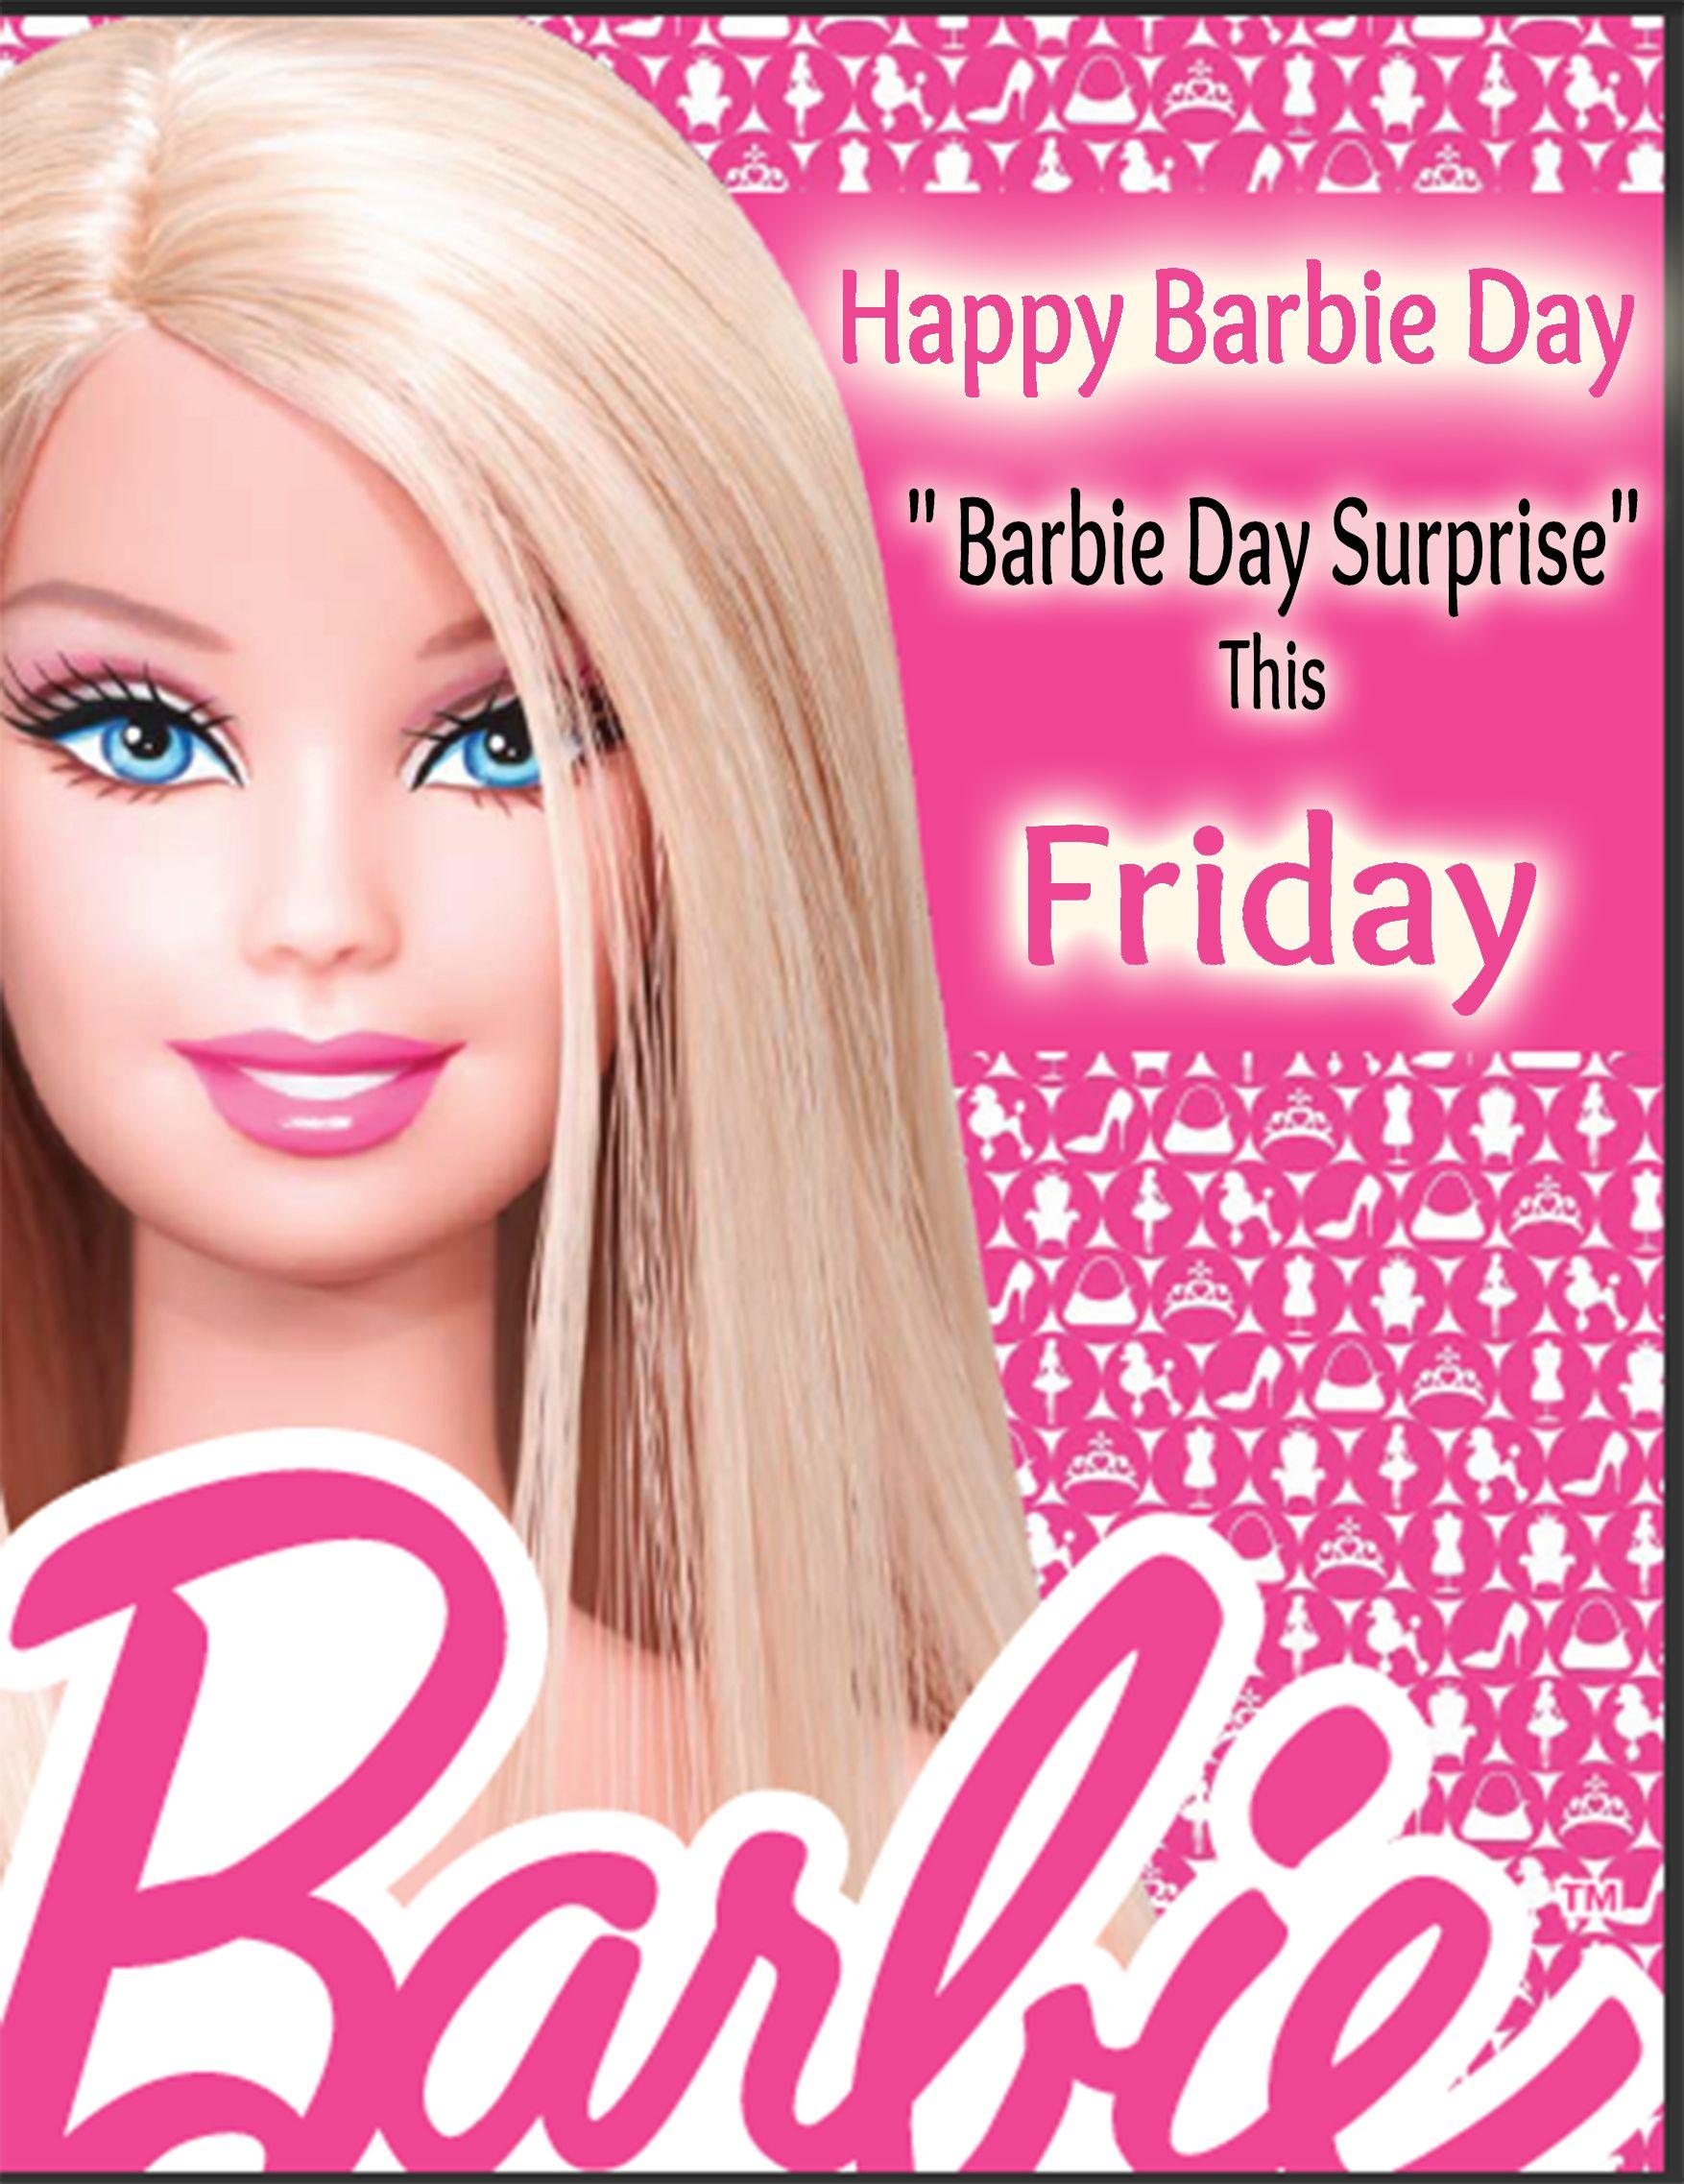 Happy Barbie Day from Toy World ) Barbie Toy_World